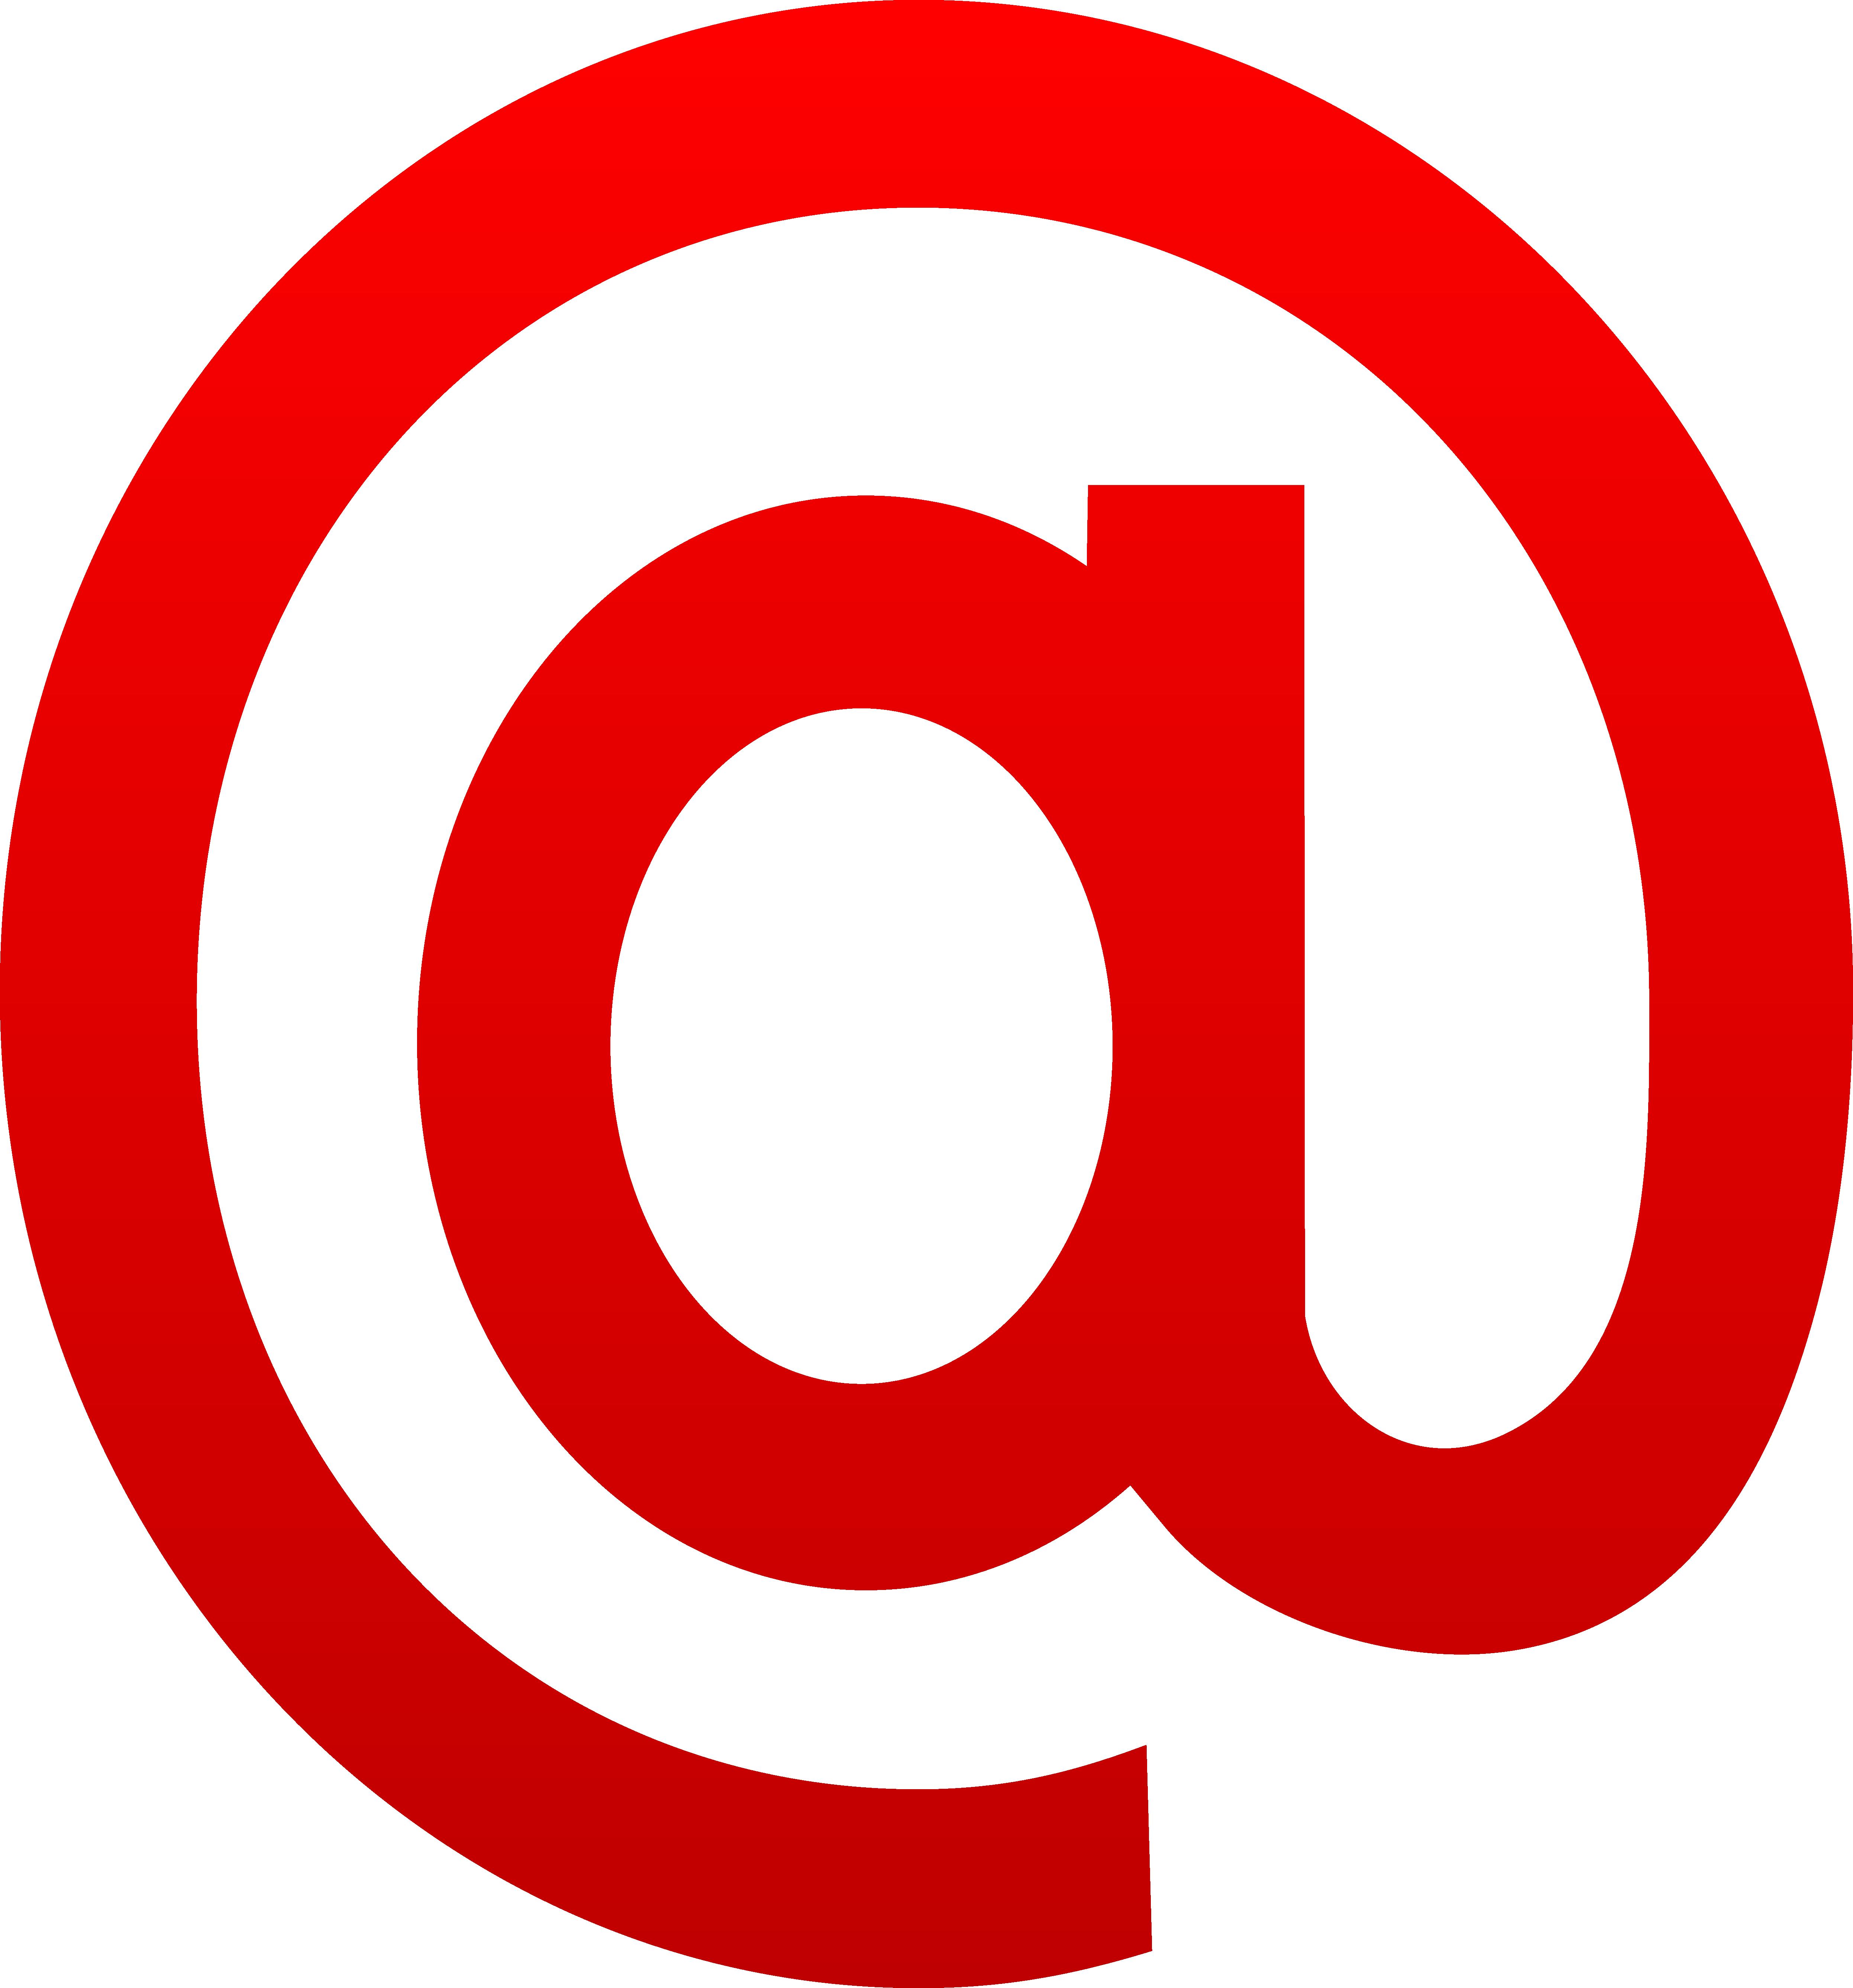 Symbol clipart Symbol Free Clipart symbol%20clipart Free